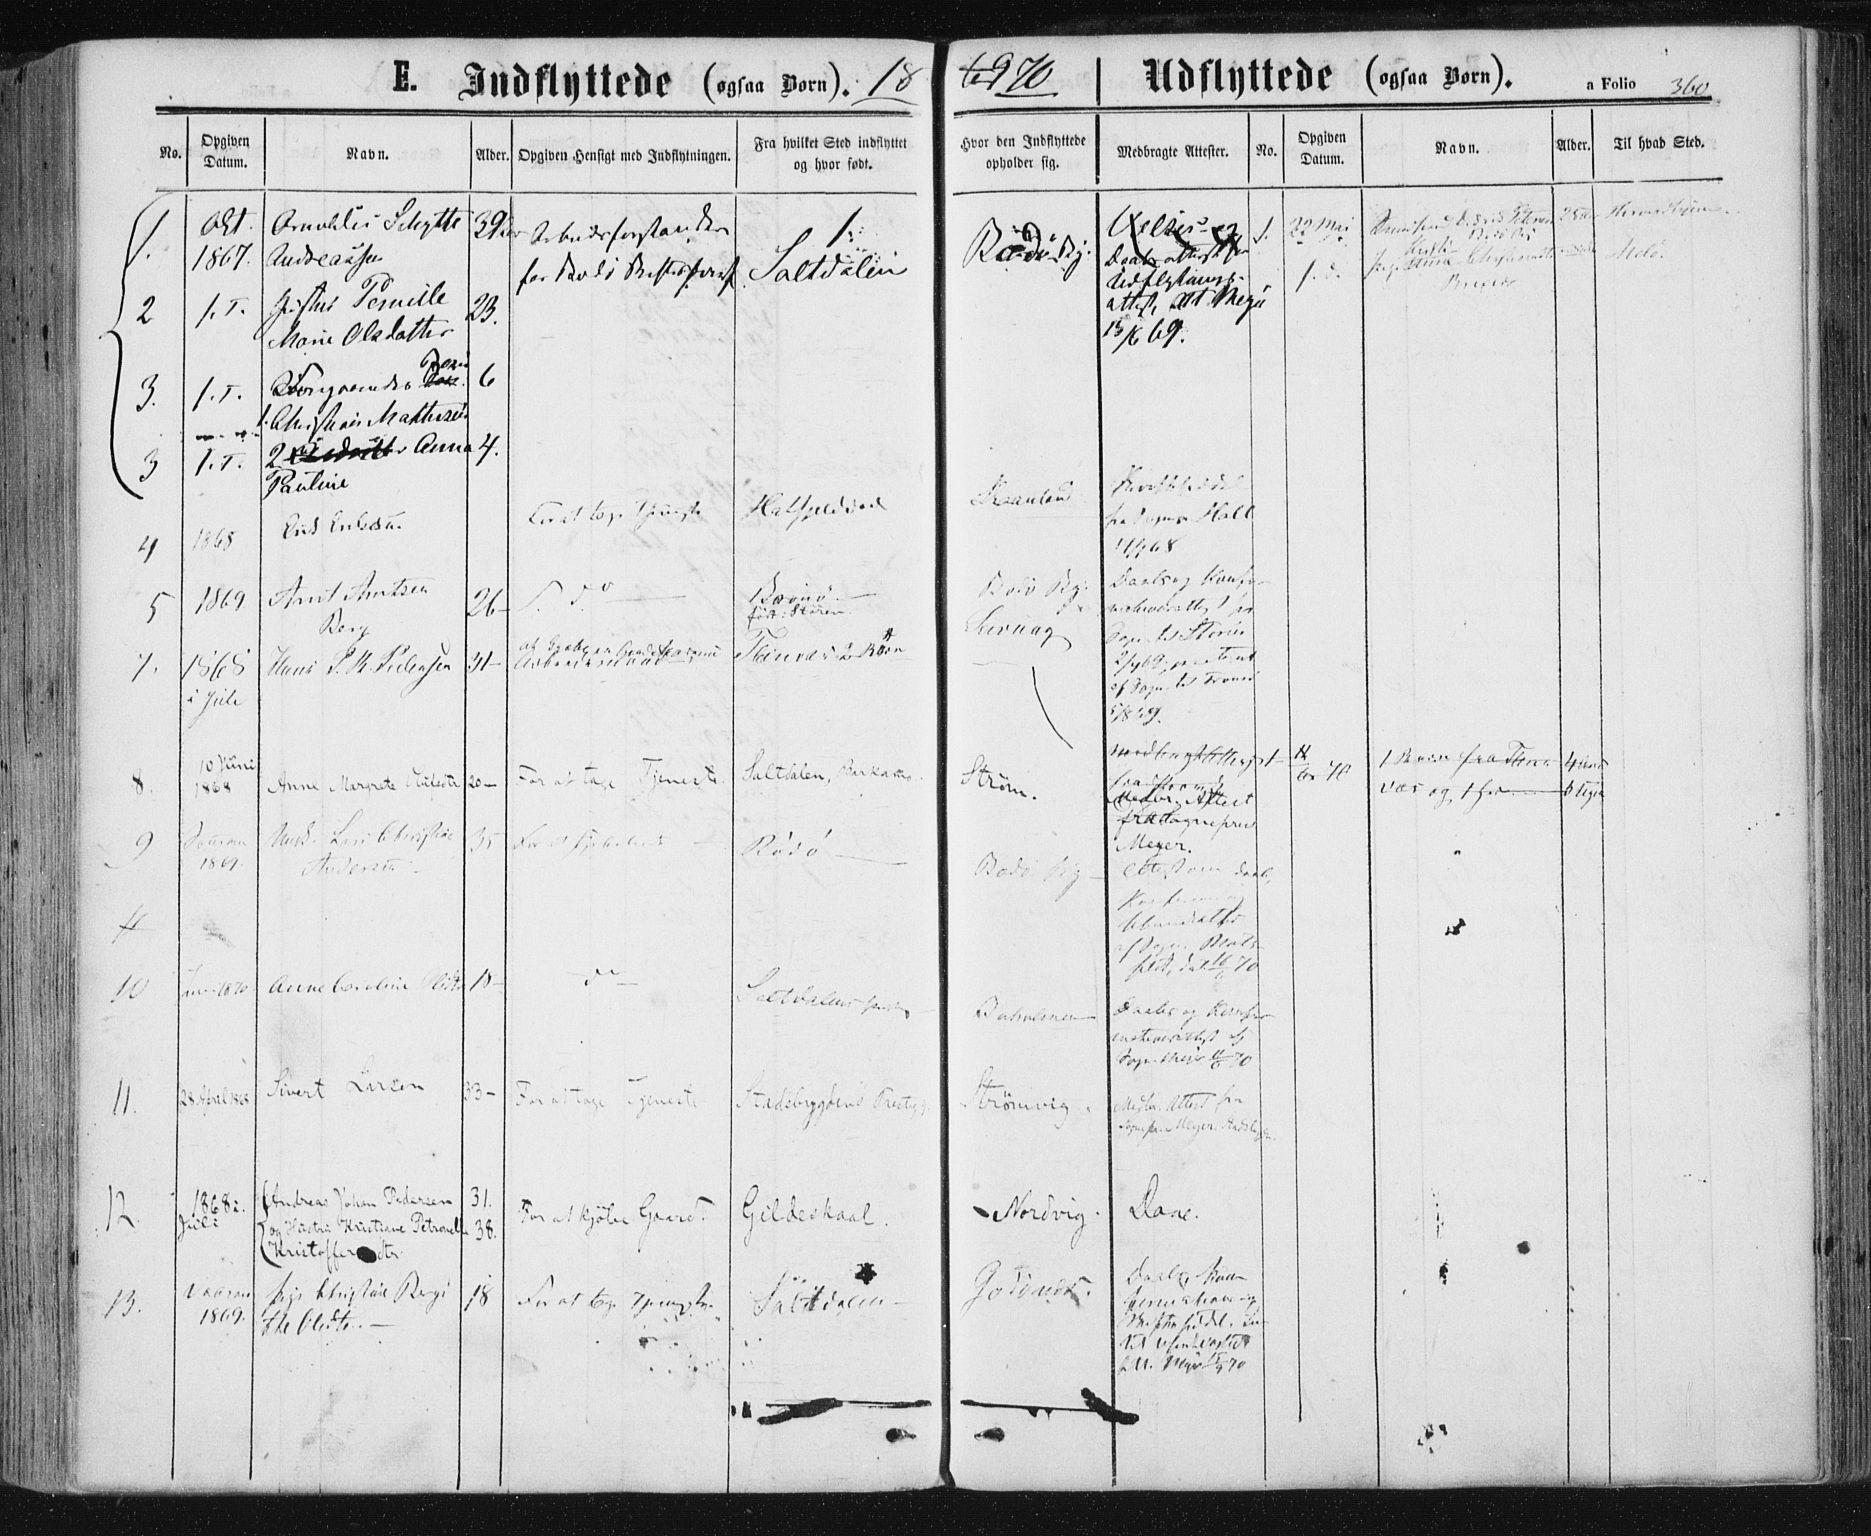 SAT, Ministerialprotokoller, klokkerbøker og fødselsregistre - Nordland, 801/L0008: Ministerialbok nr. 801A08, 1864-1875, s. 360